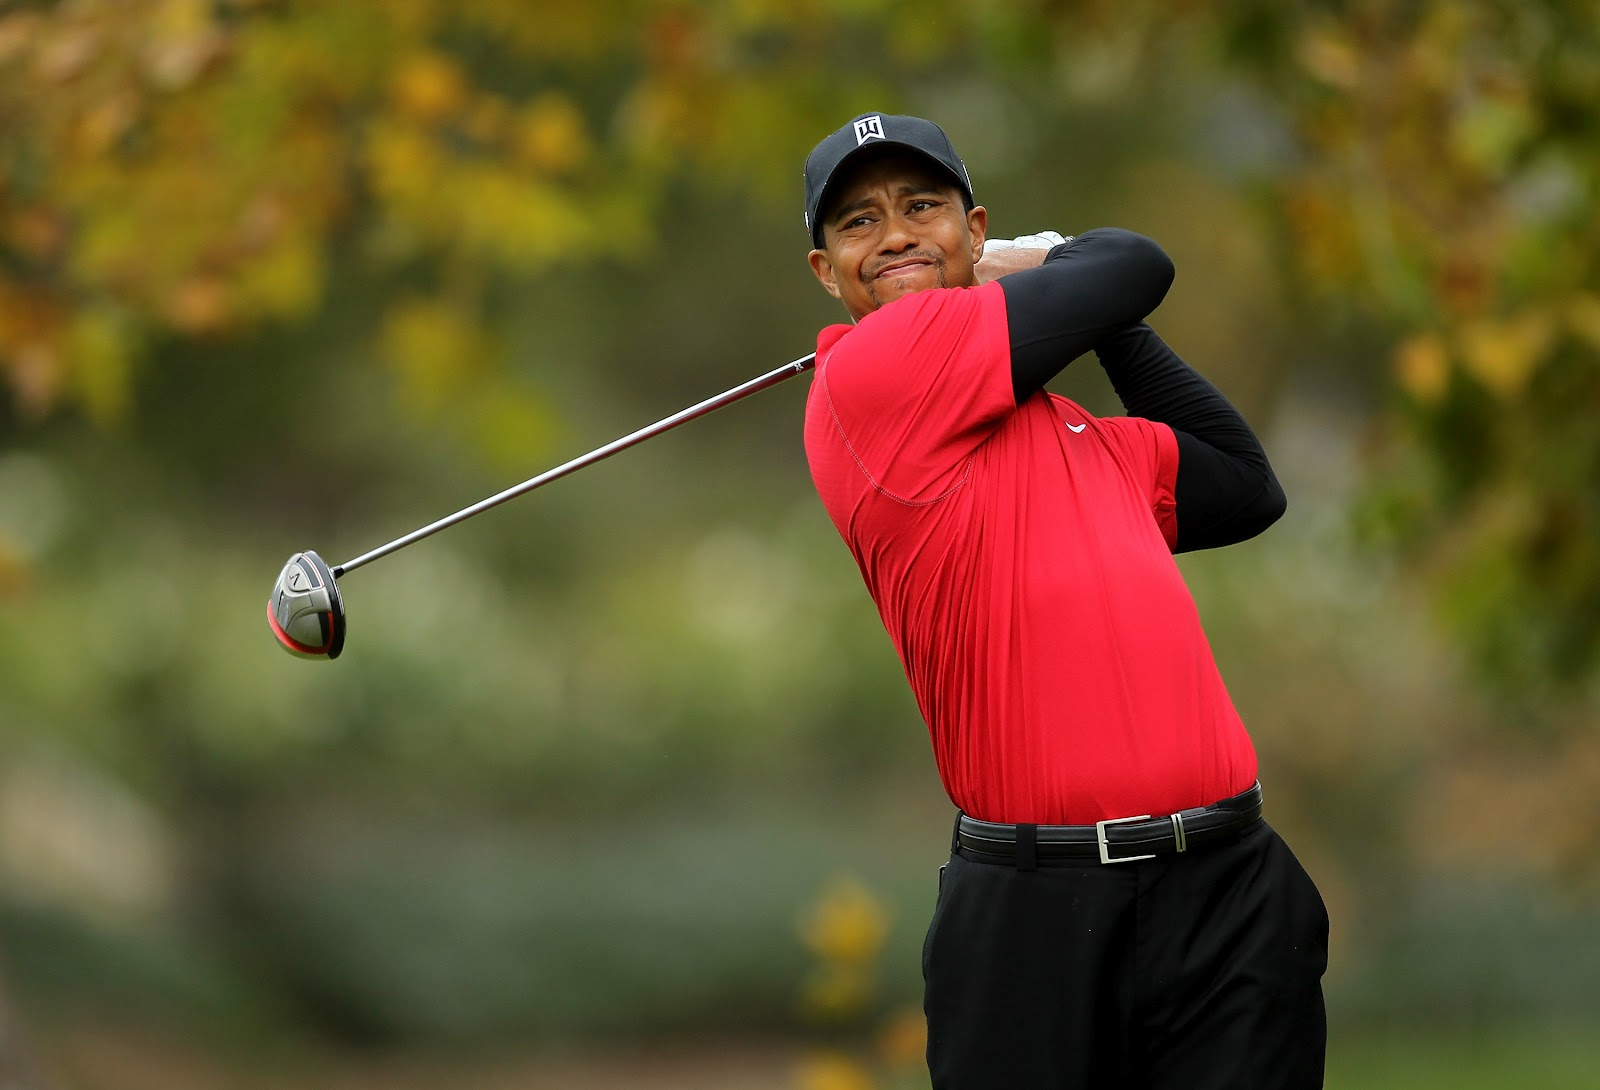 Life Around Us: Tiger Woods Biography